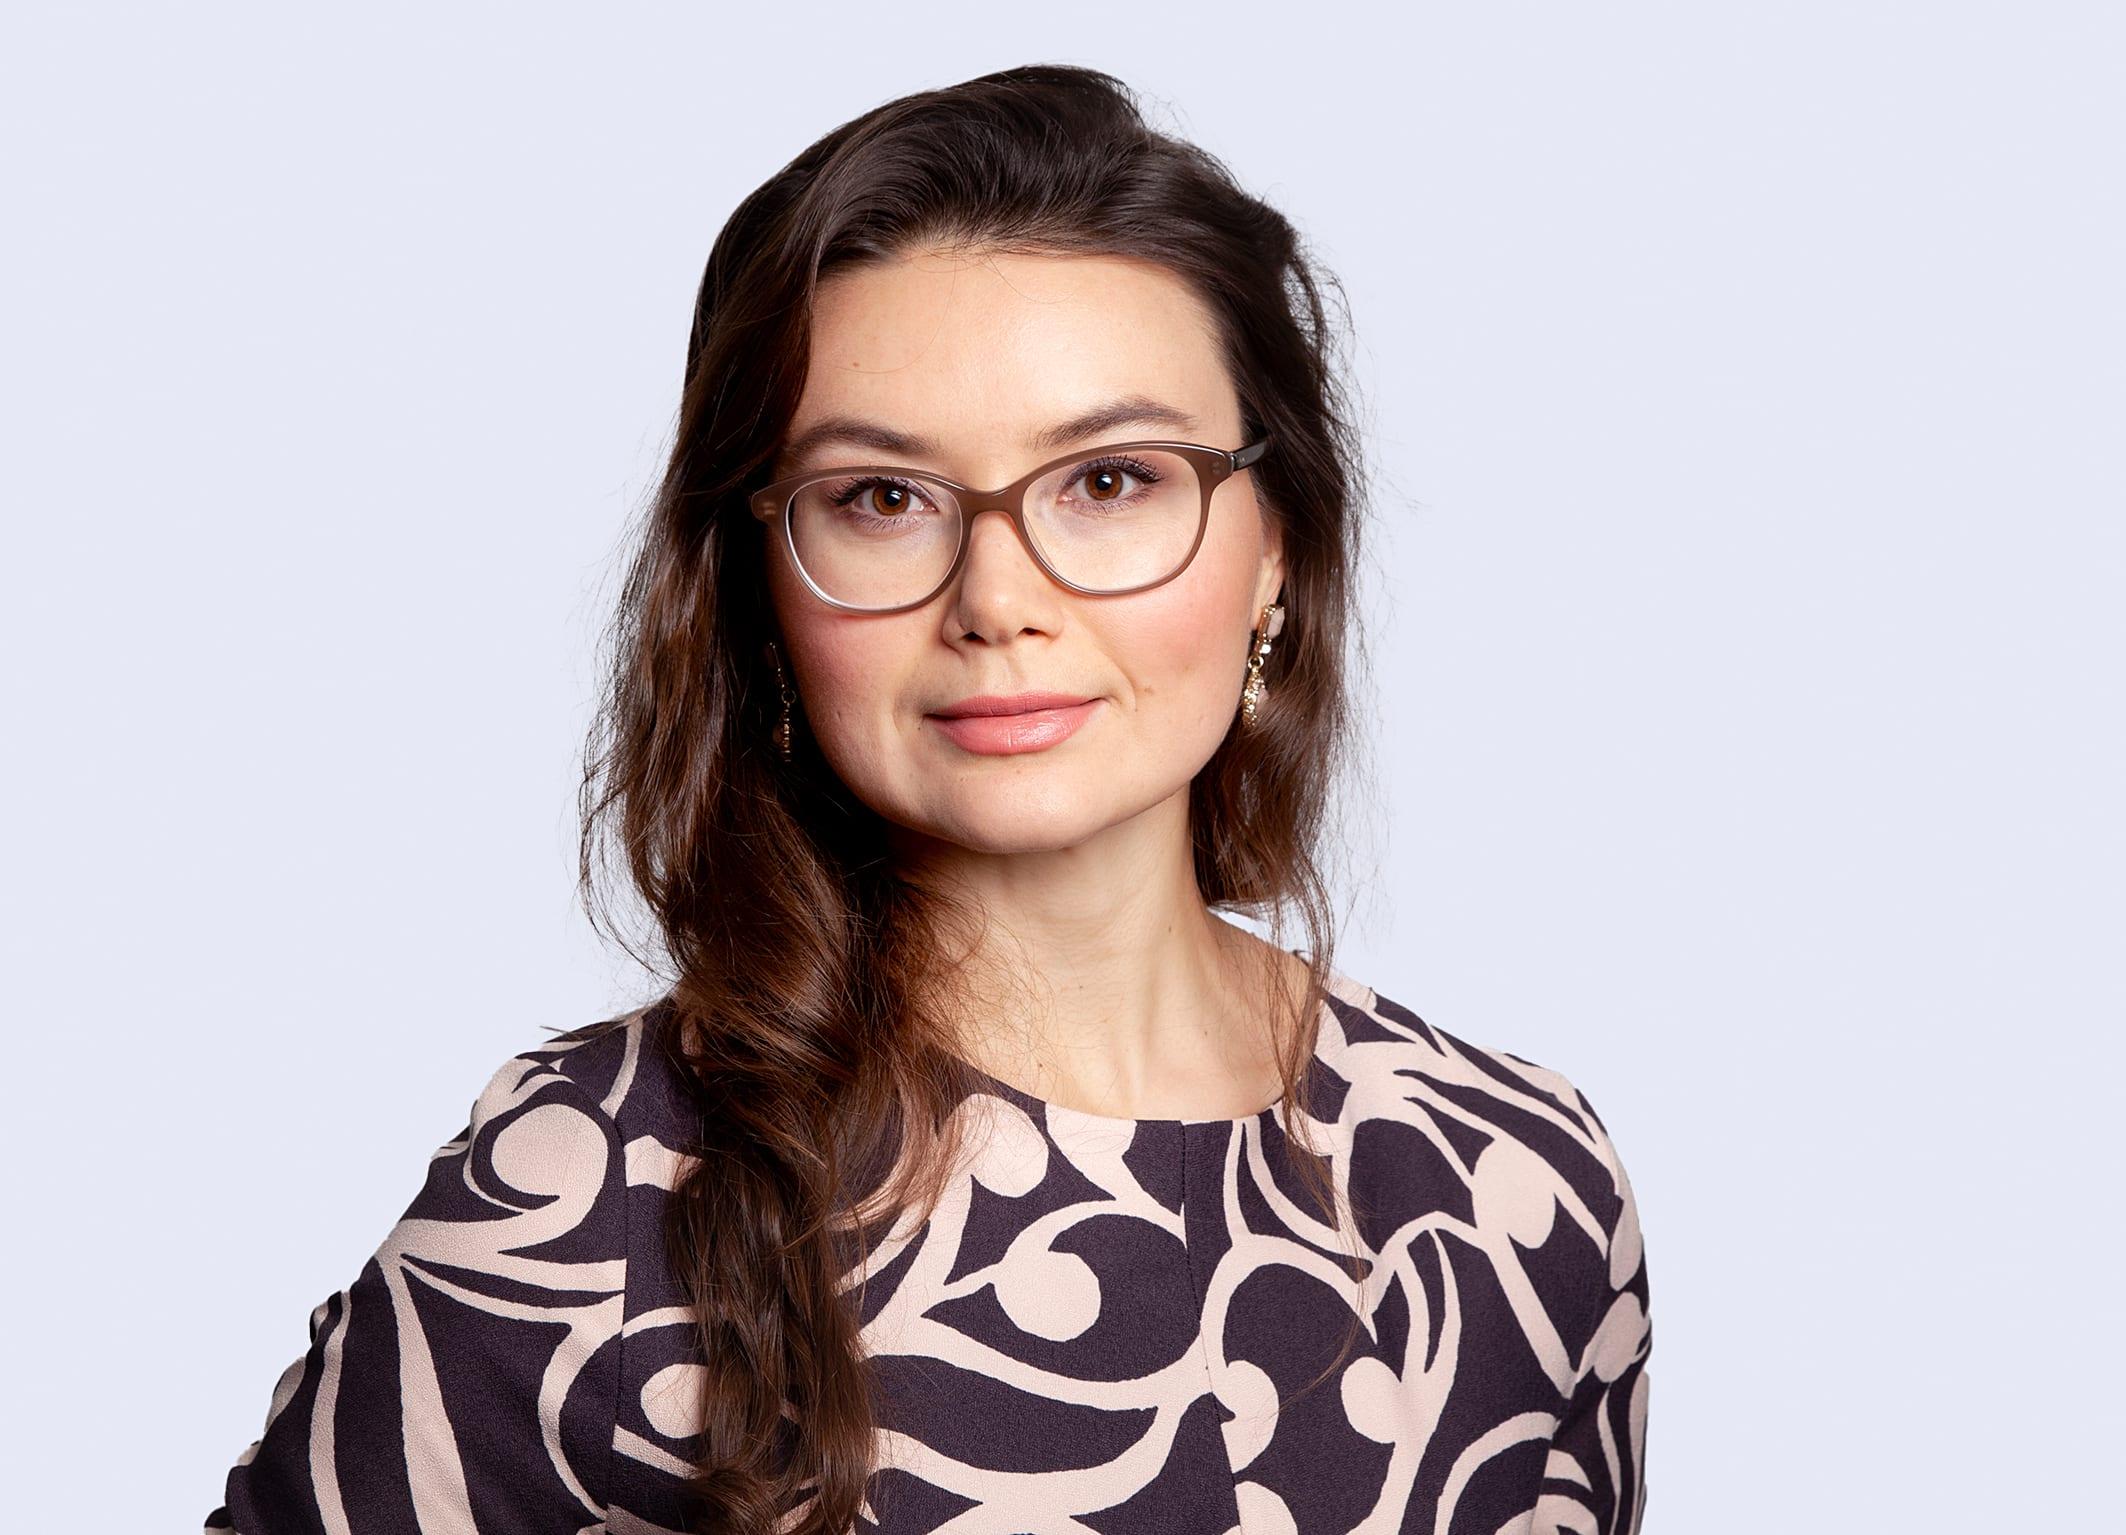 Anna Tryti